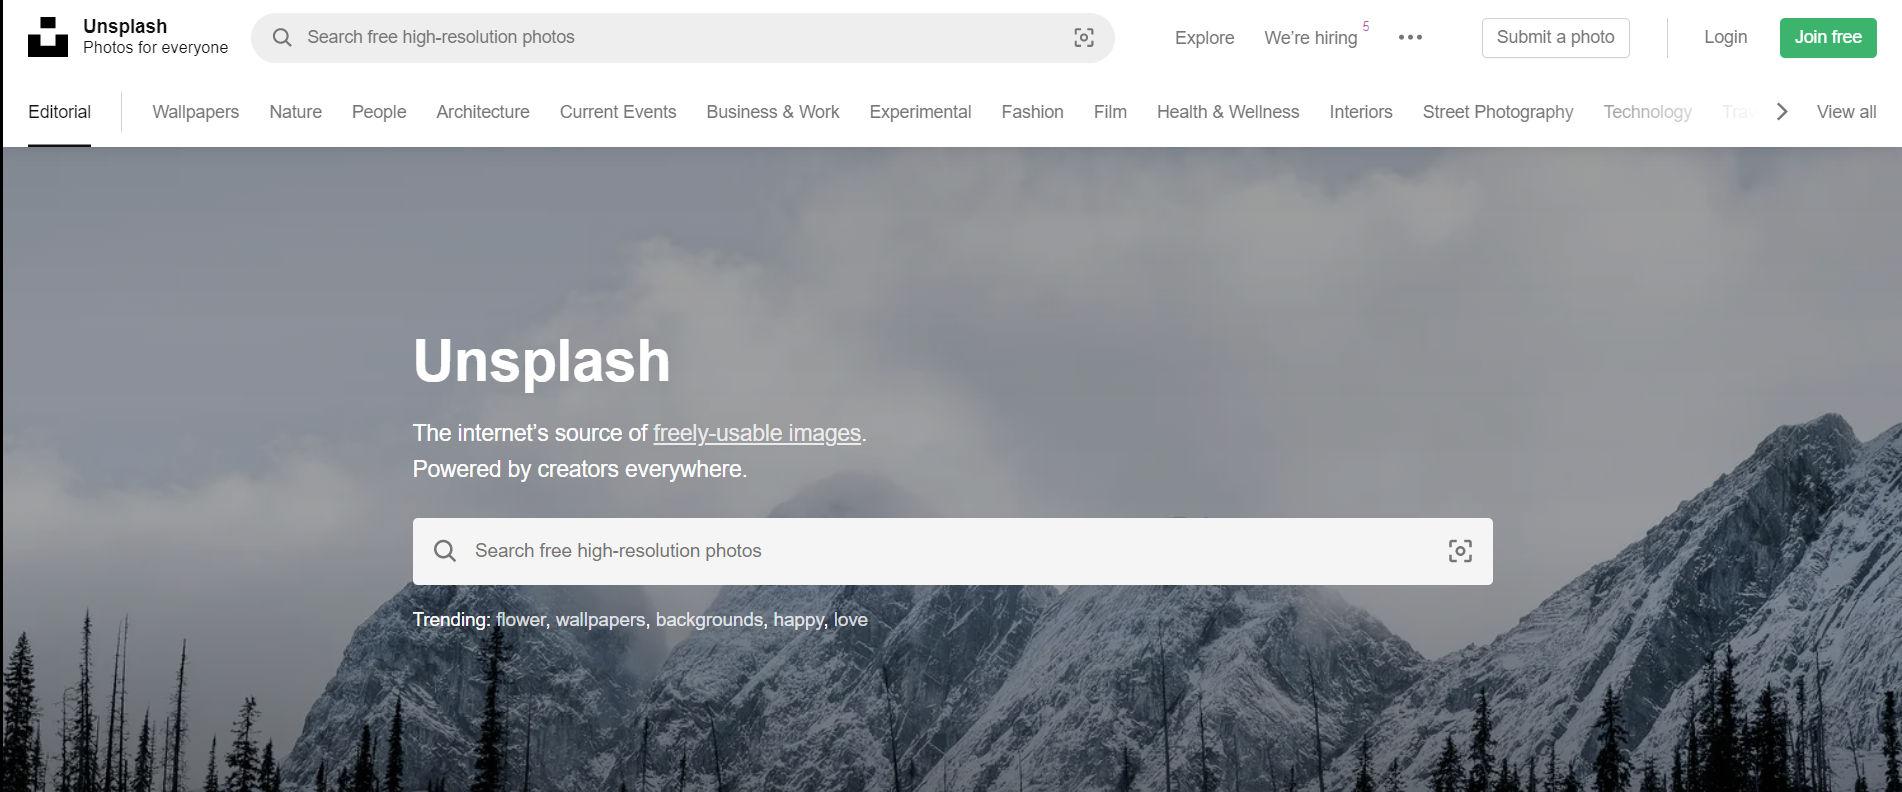 Unsplash photo search engine